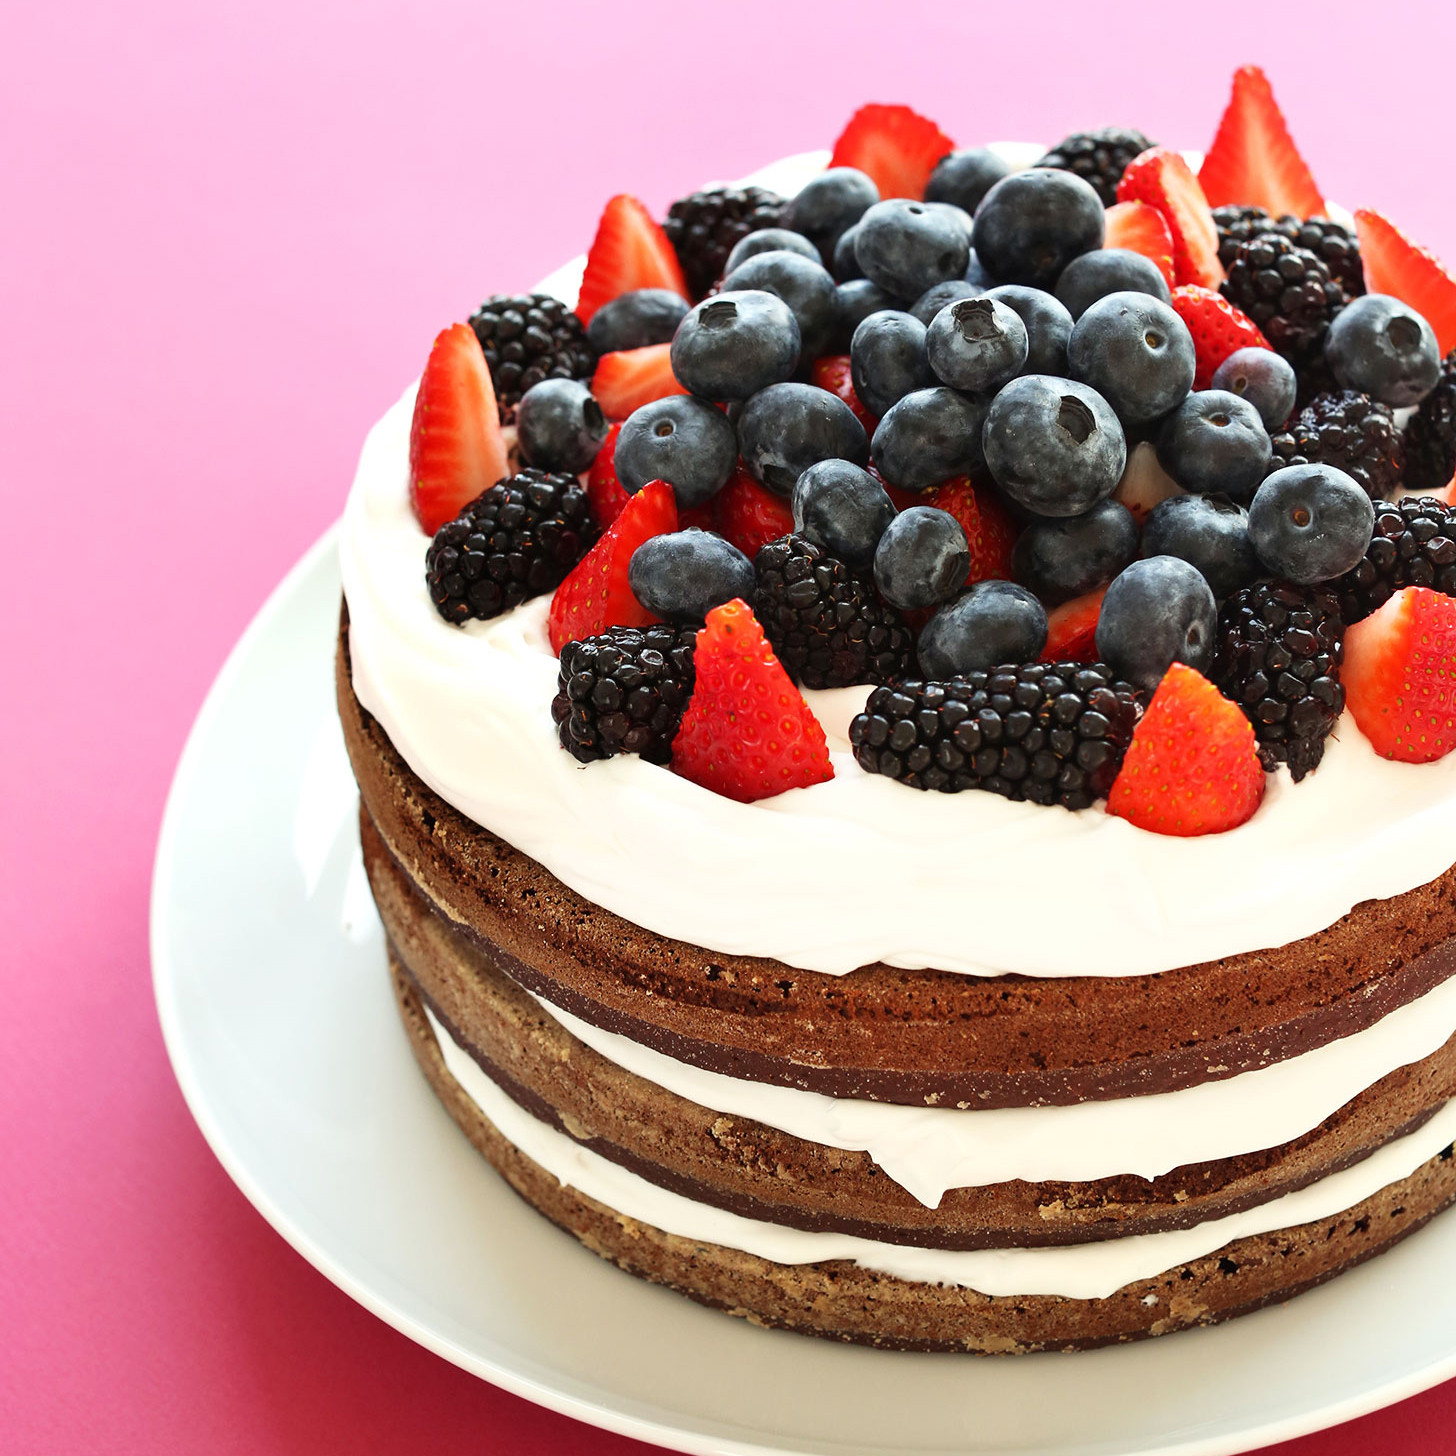 Memorial Day Dessert Recipe  10 Memorial Day Desserts That Will Brighten Up Your